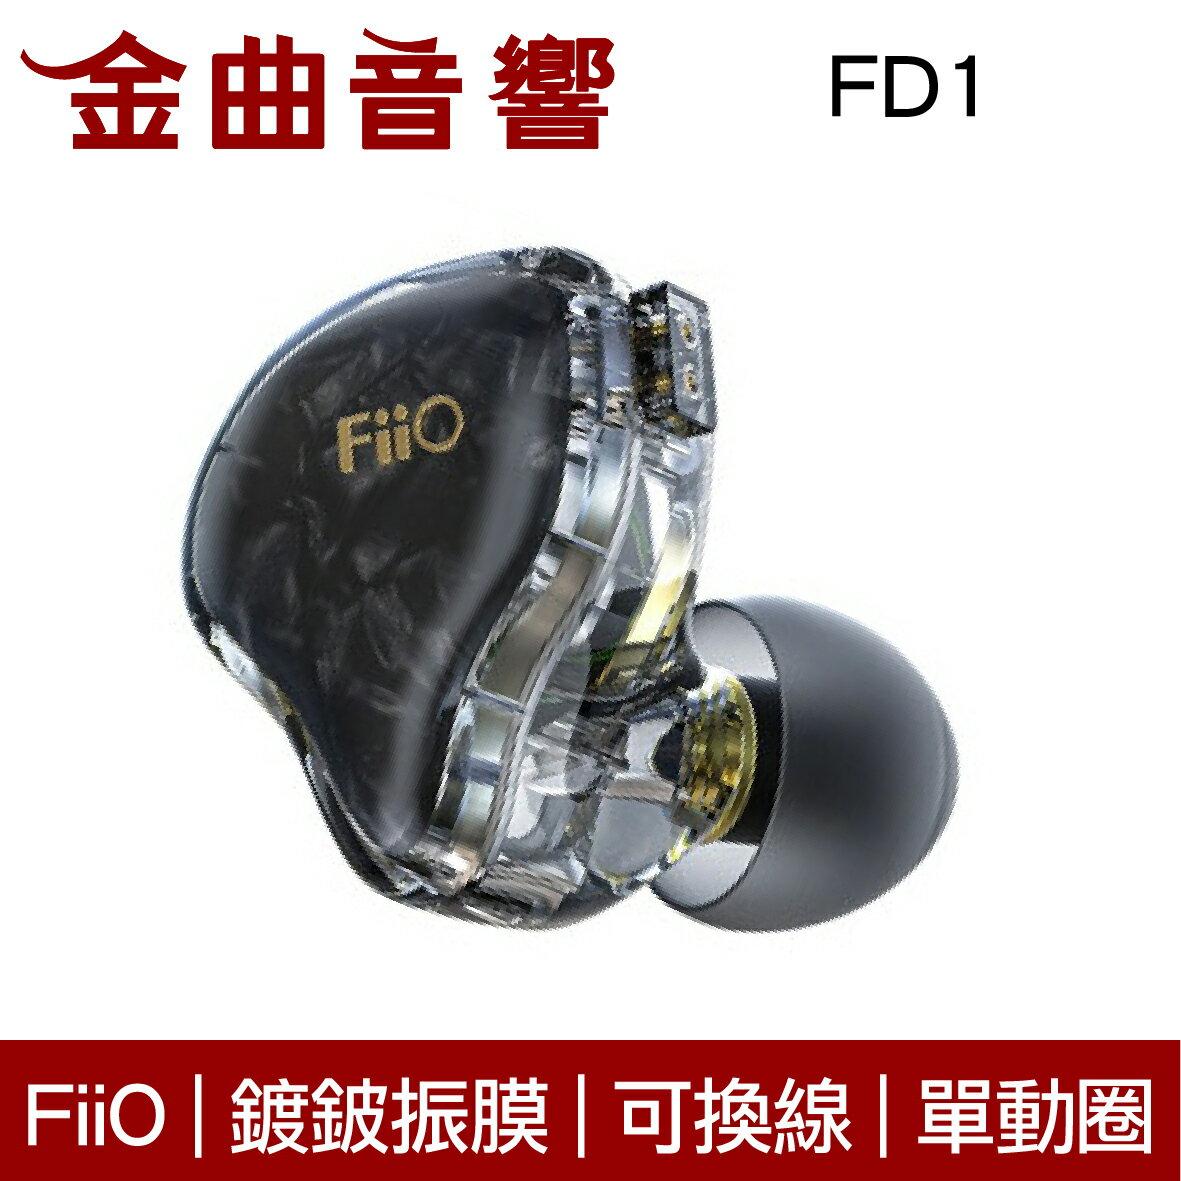 FiiO FD1 鍍鈹振膜 單動圈 CIEM 可換線 耳道式 耳機 | 金曲音響